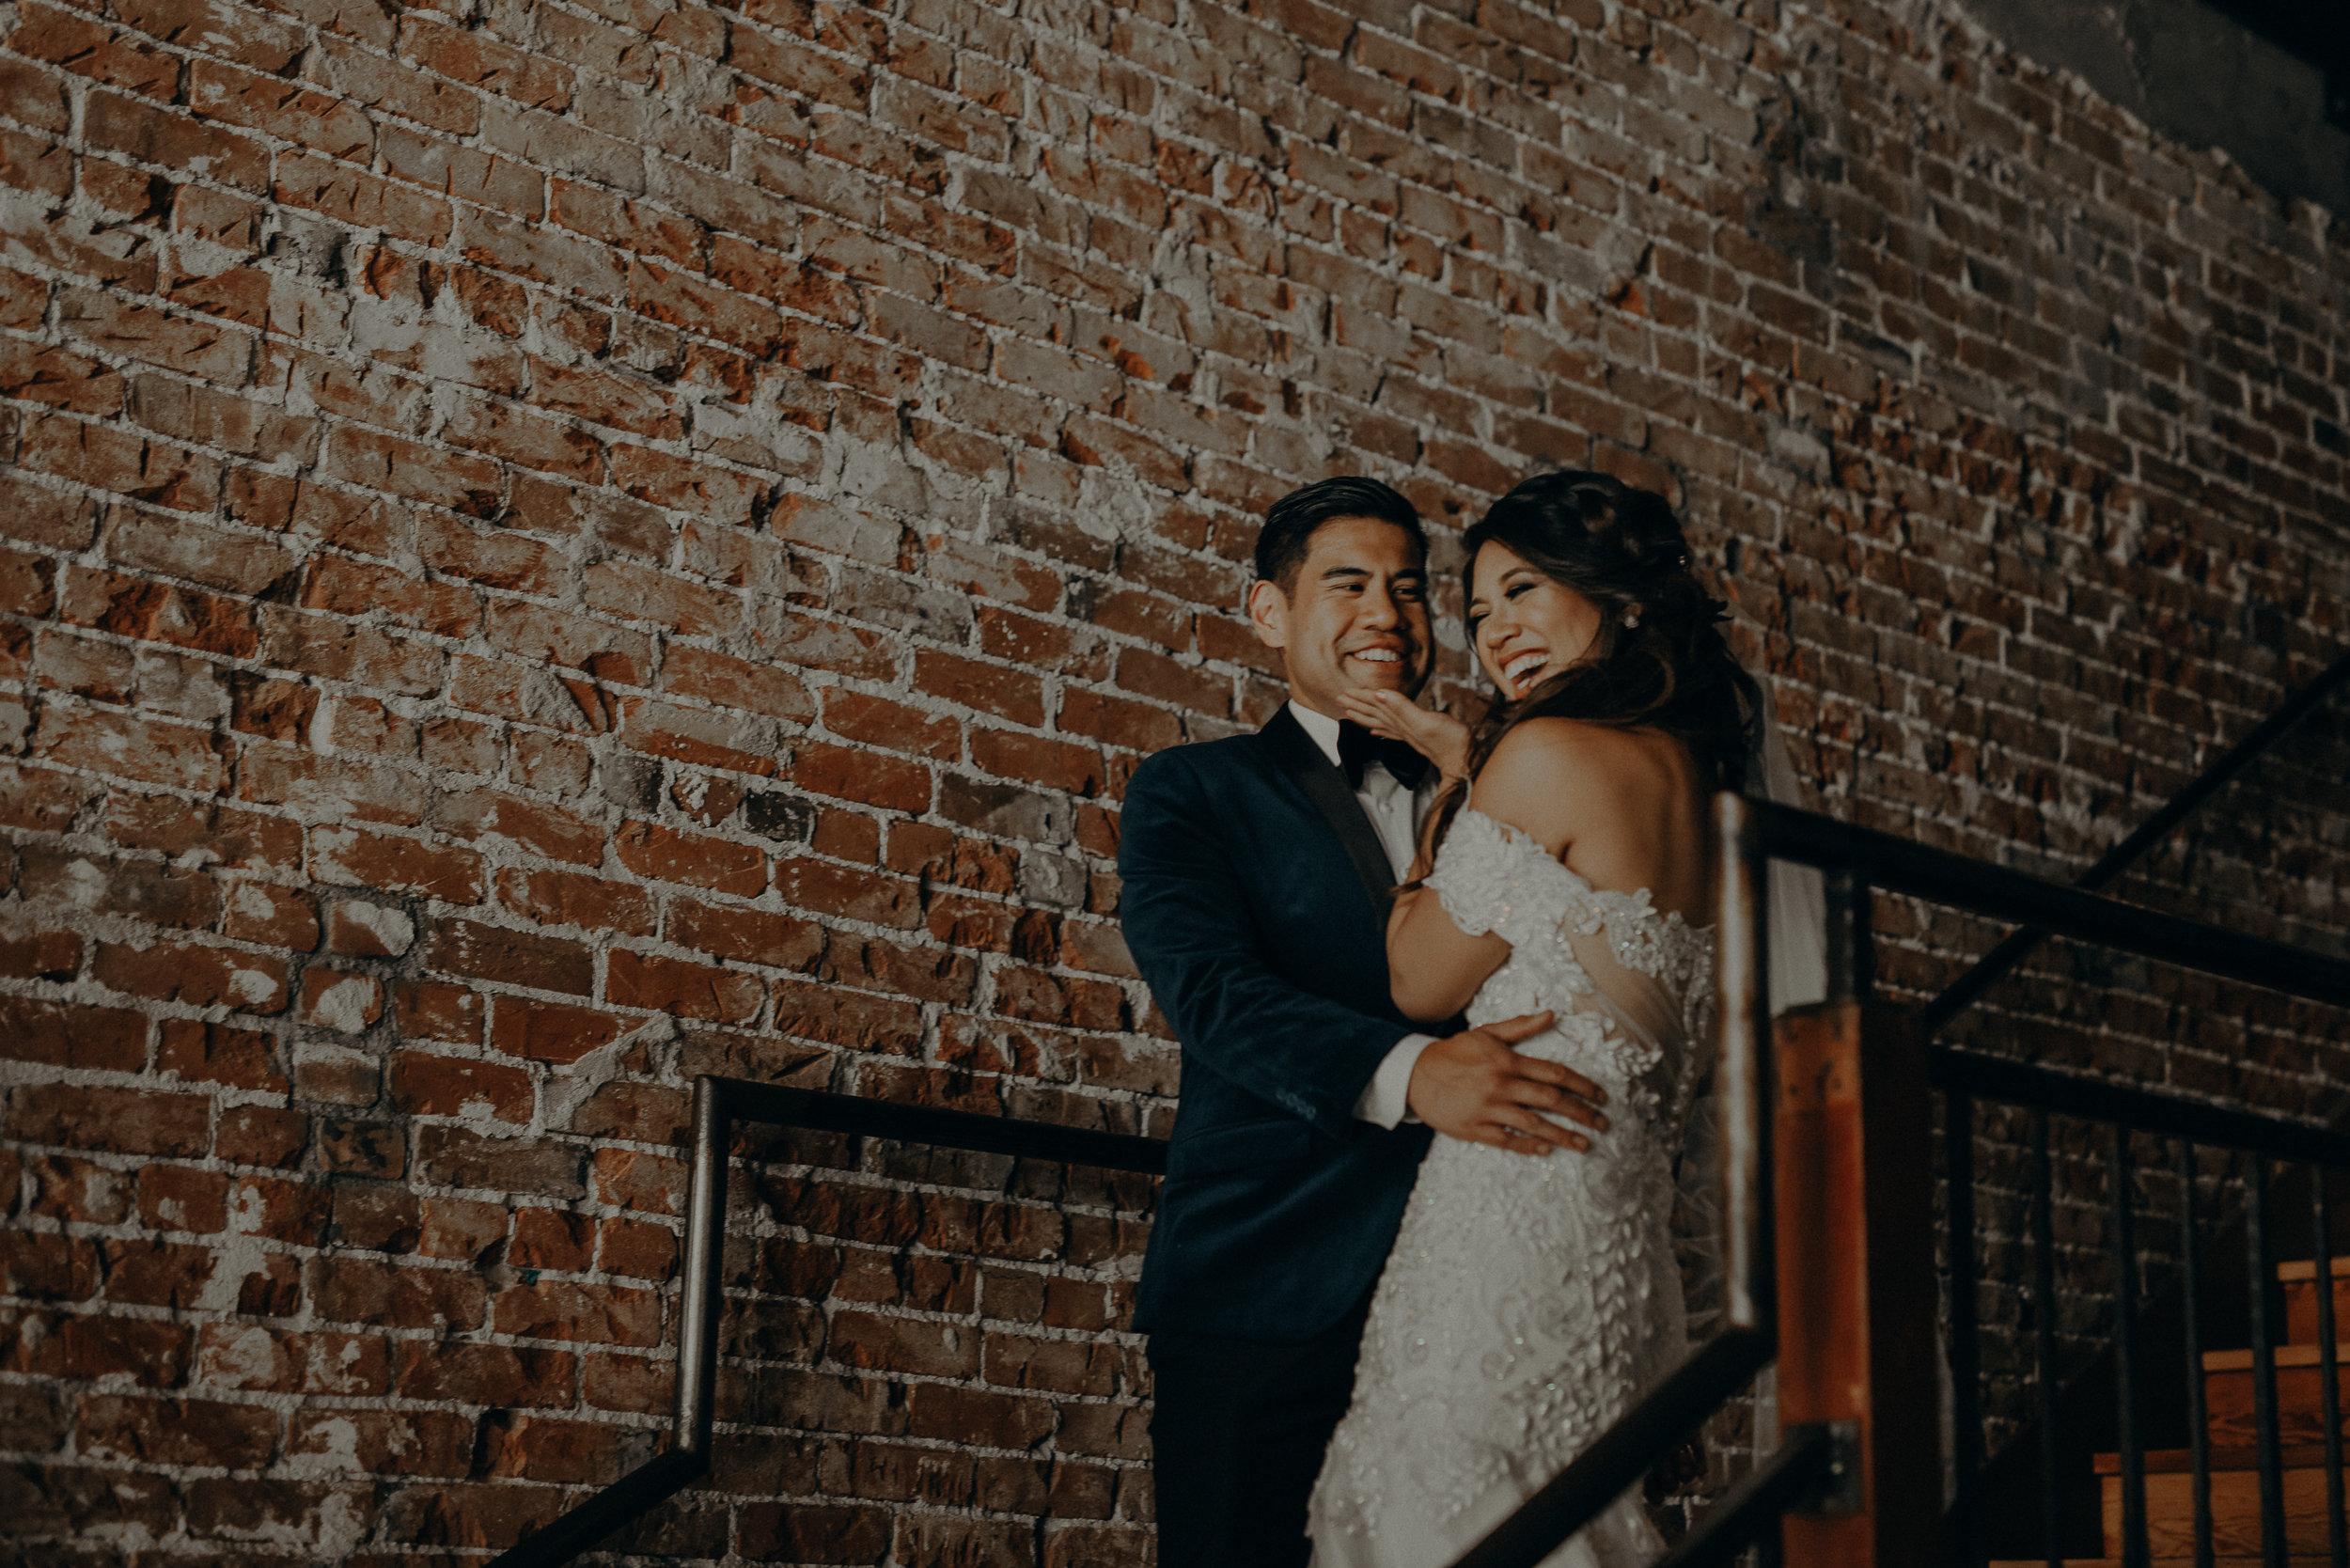 ©Isaiah + Taylor Photography - the Loft on Pine Wedding, Long Beach Wedding Photographer-109.jpg